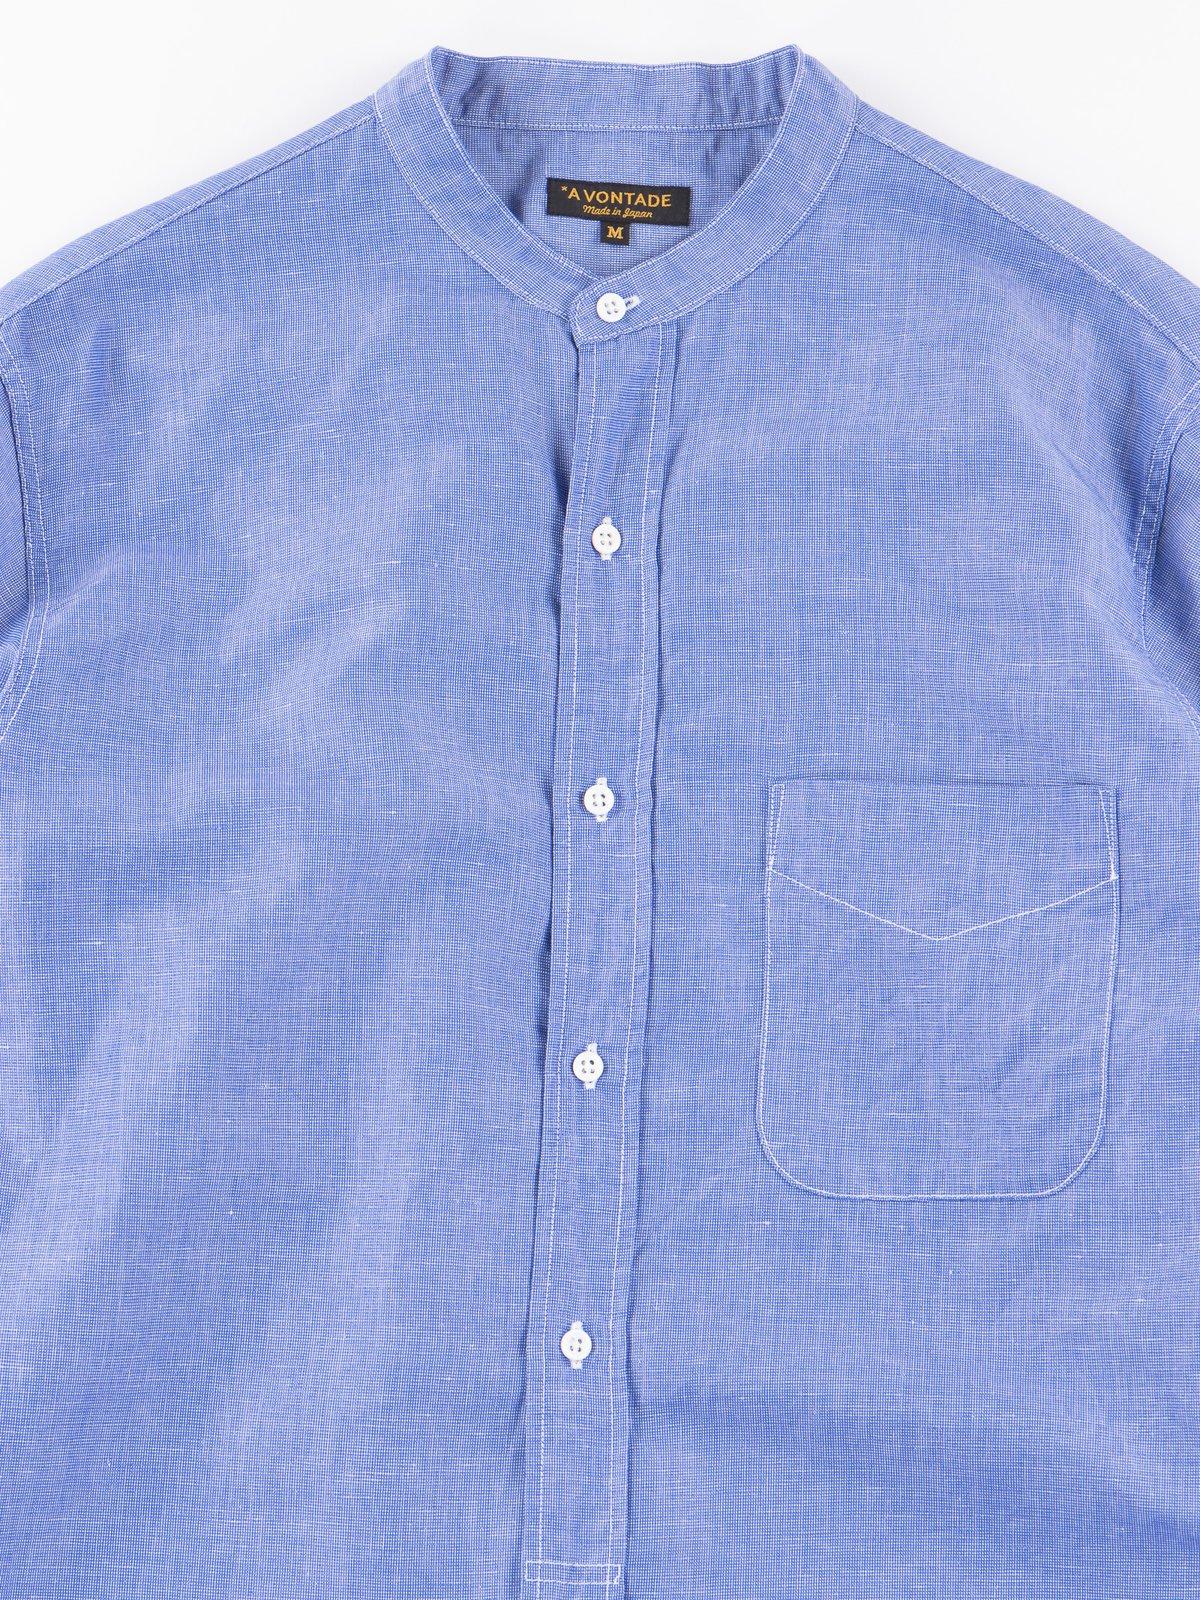 Blue End on End Banded Collar Shirt - Image 2